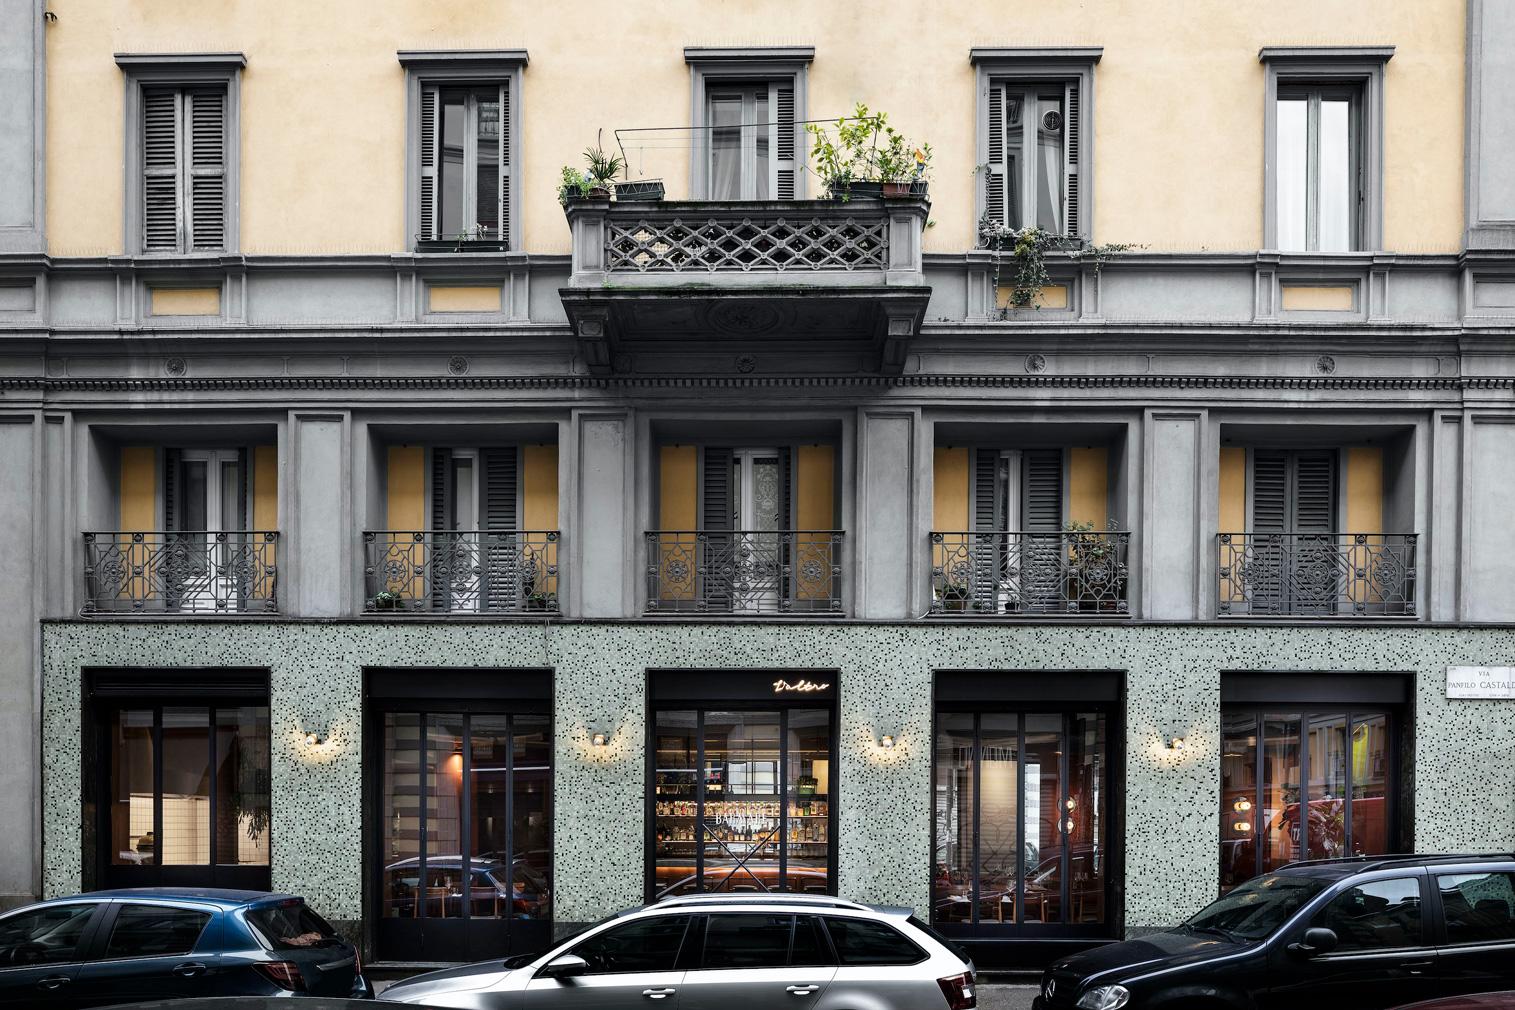 Milan's Barmare l'Altro restaurant has a nautical flare